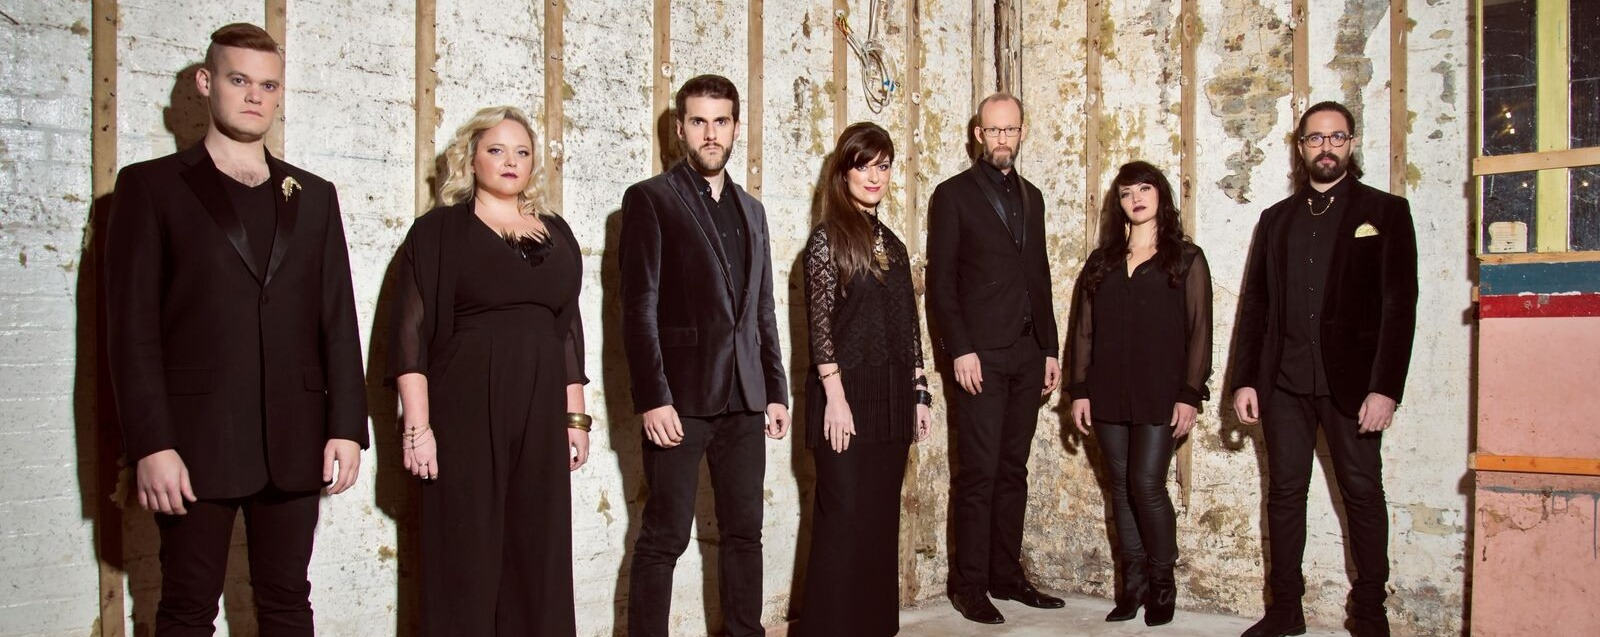 Esplanade Presents: The Swingles (UK)